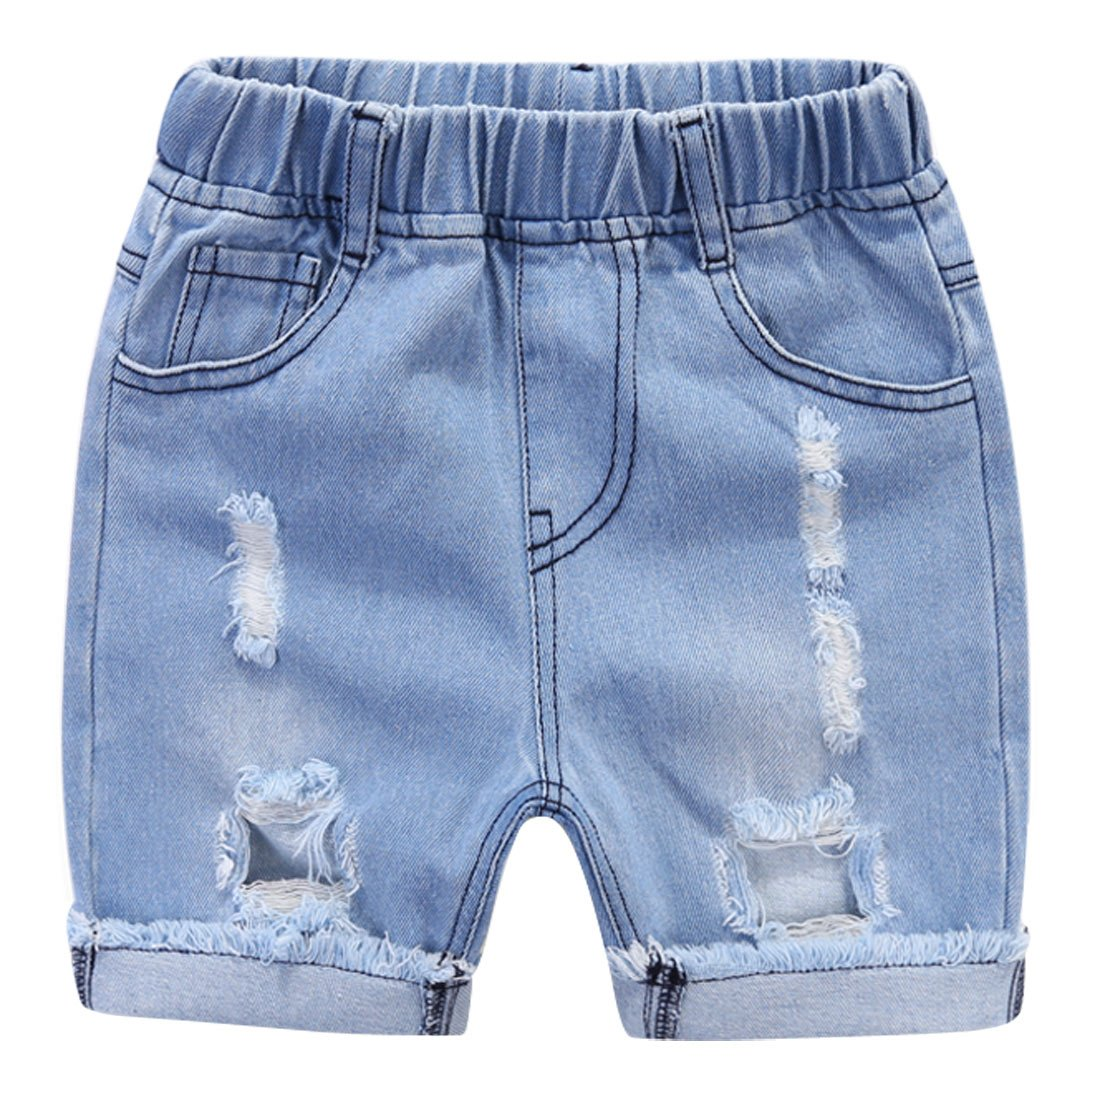 Boy Jeans Short Pants Blue Jeans Denim Short Pants Elastic Belt Short Trousers Jeans for Little Girls Boys Light Blue